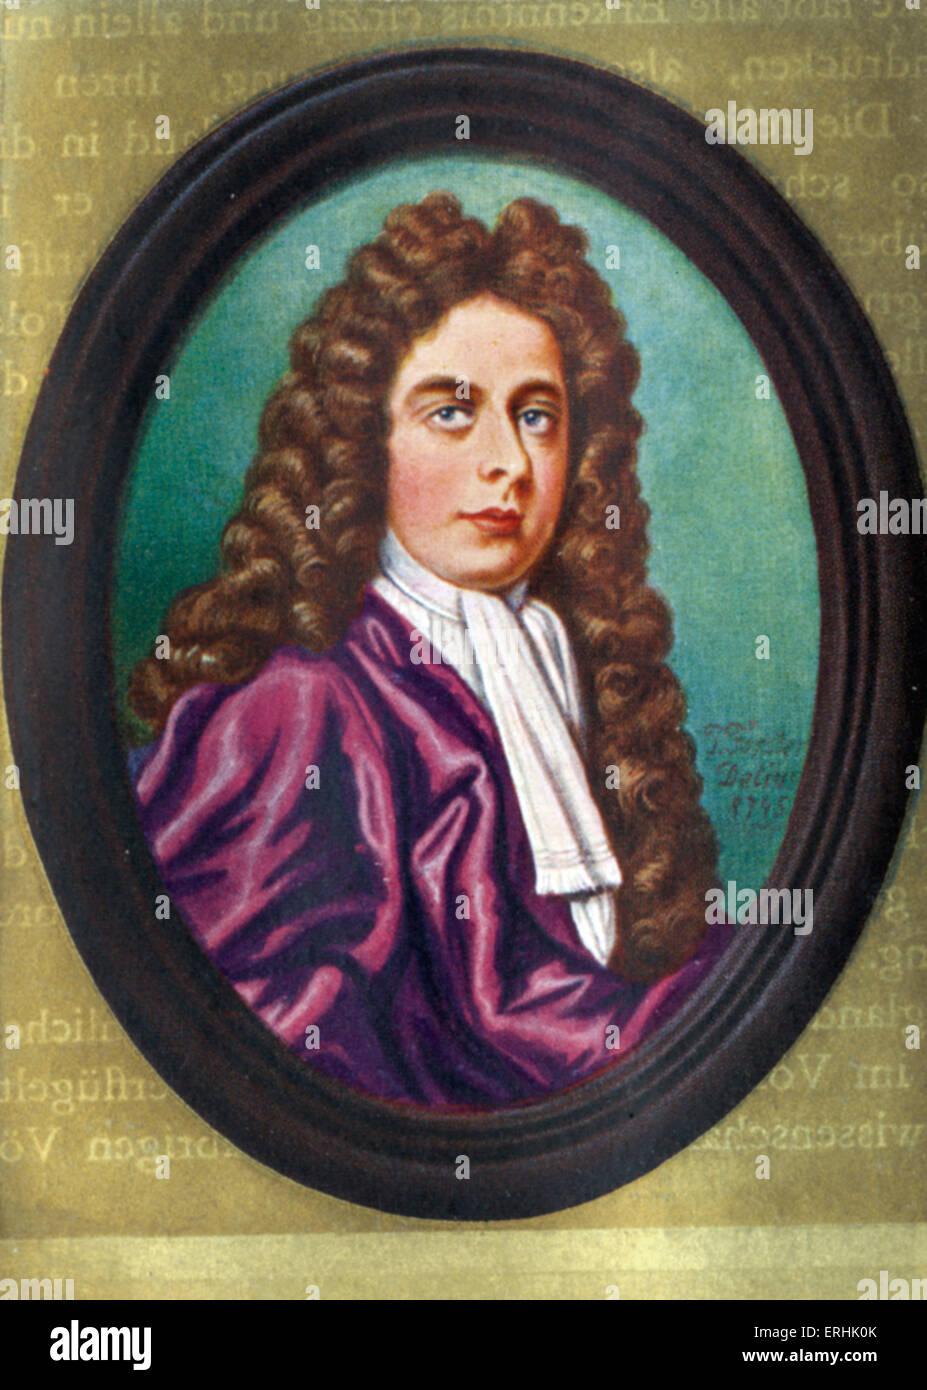 John Churchill. Portrait of the 1st Duke of Marlborough. 26 May 1650 – 16 June 1722 - Stock Image